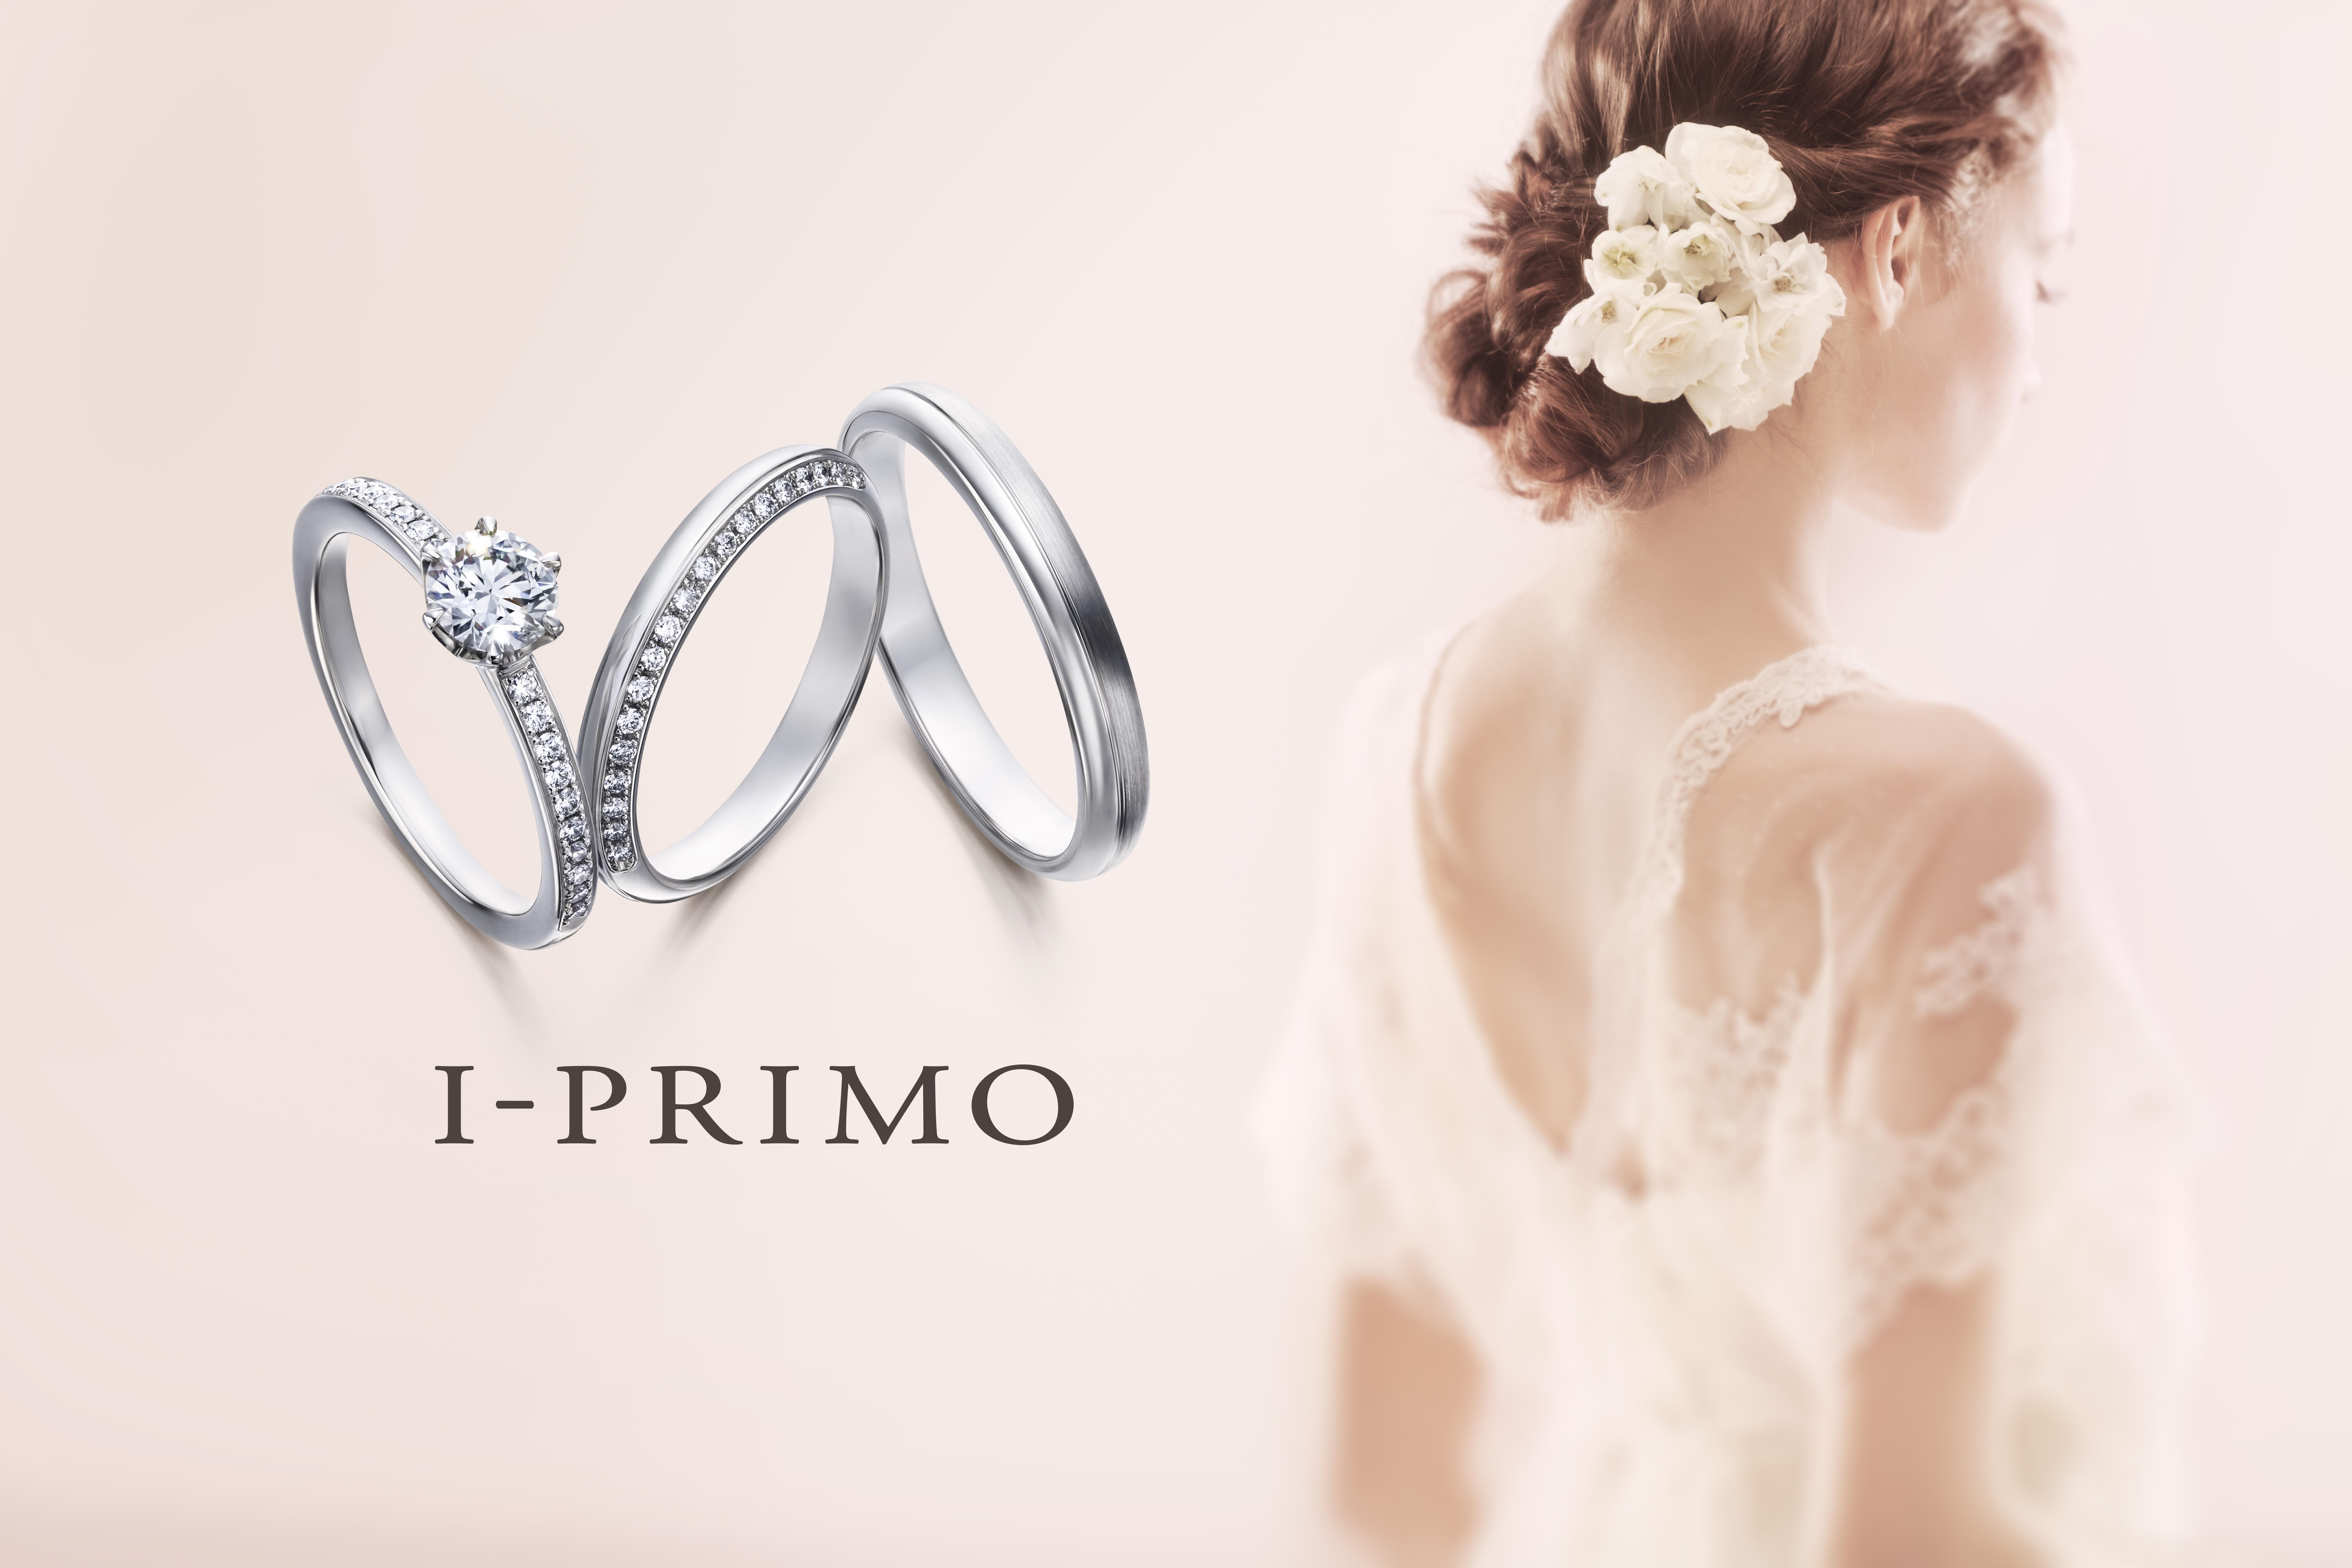 I-PRIMO